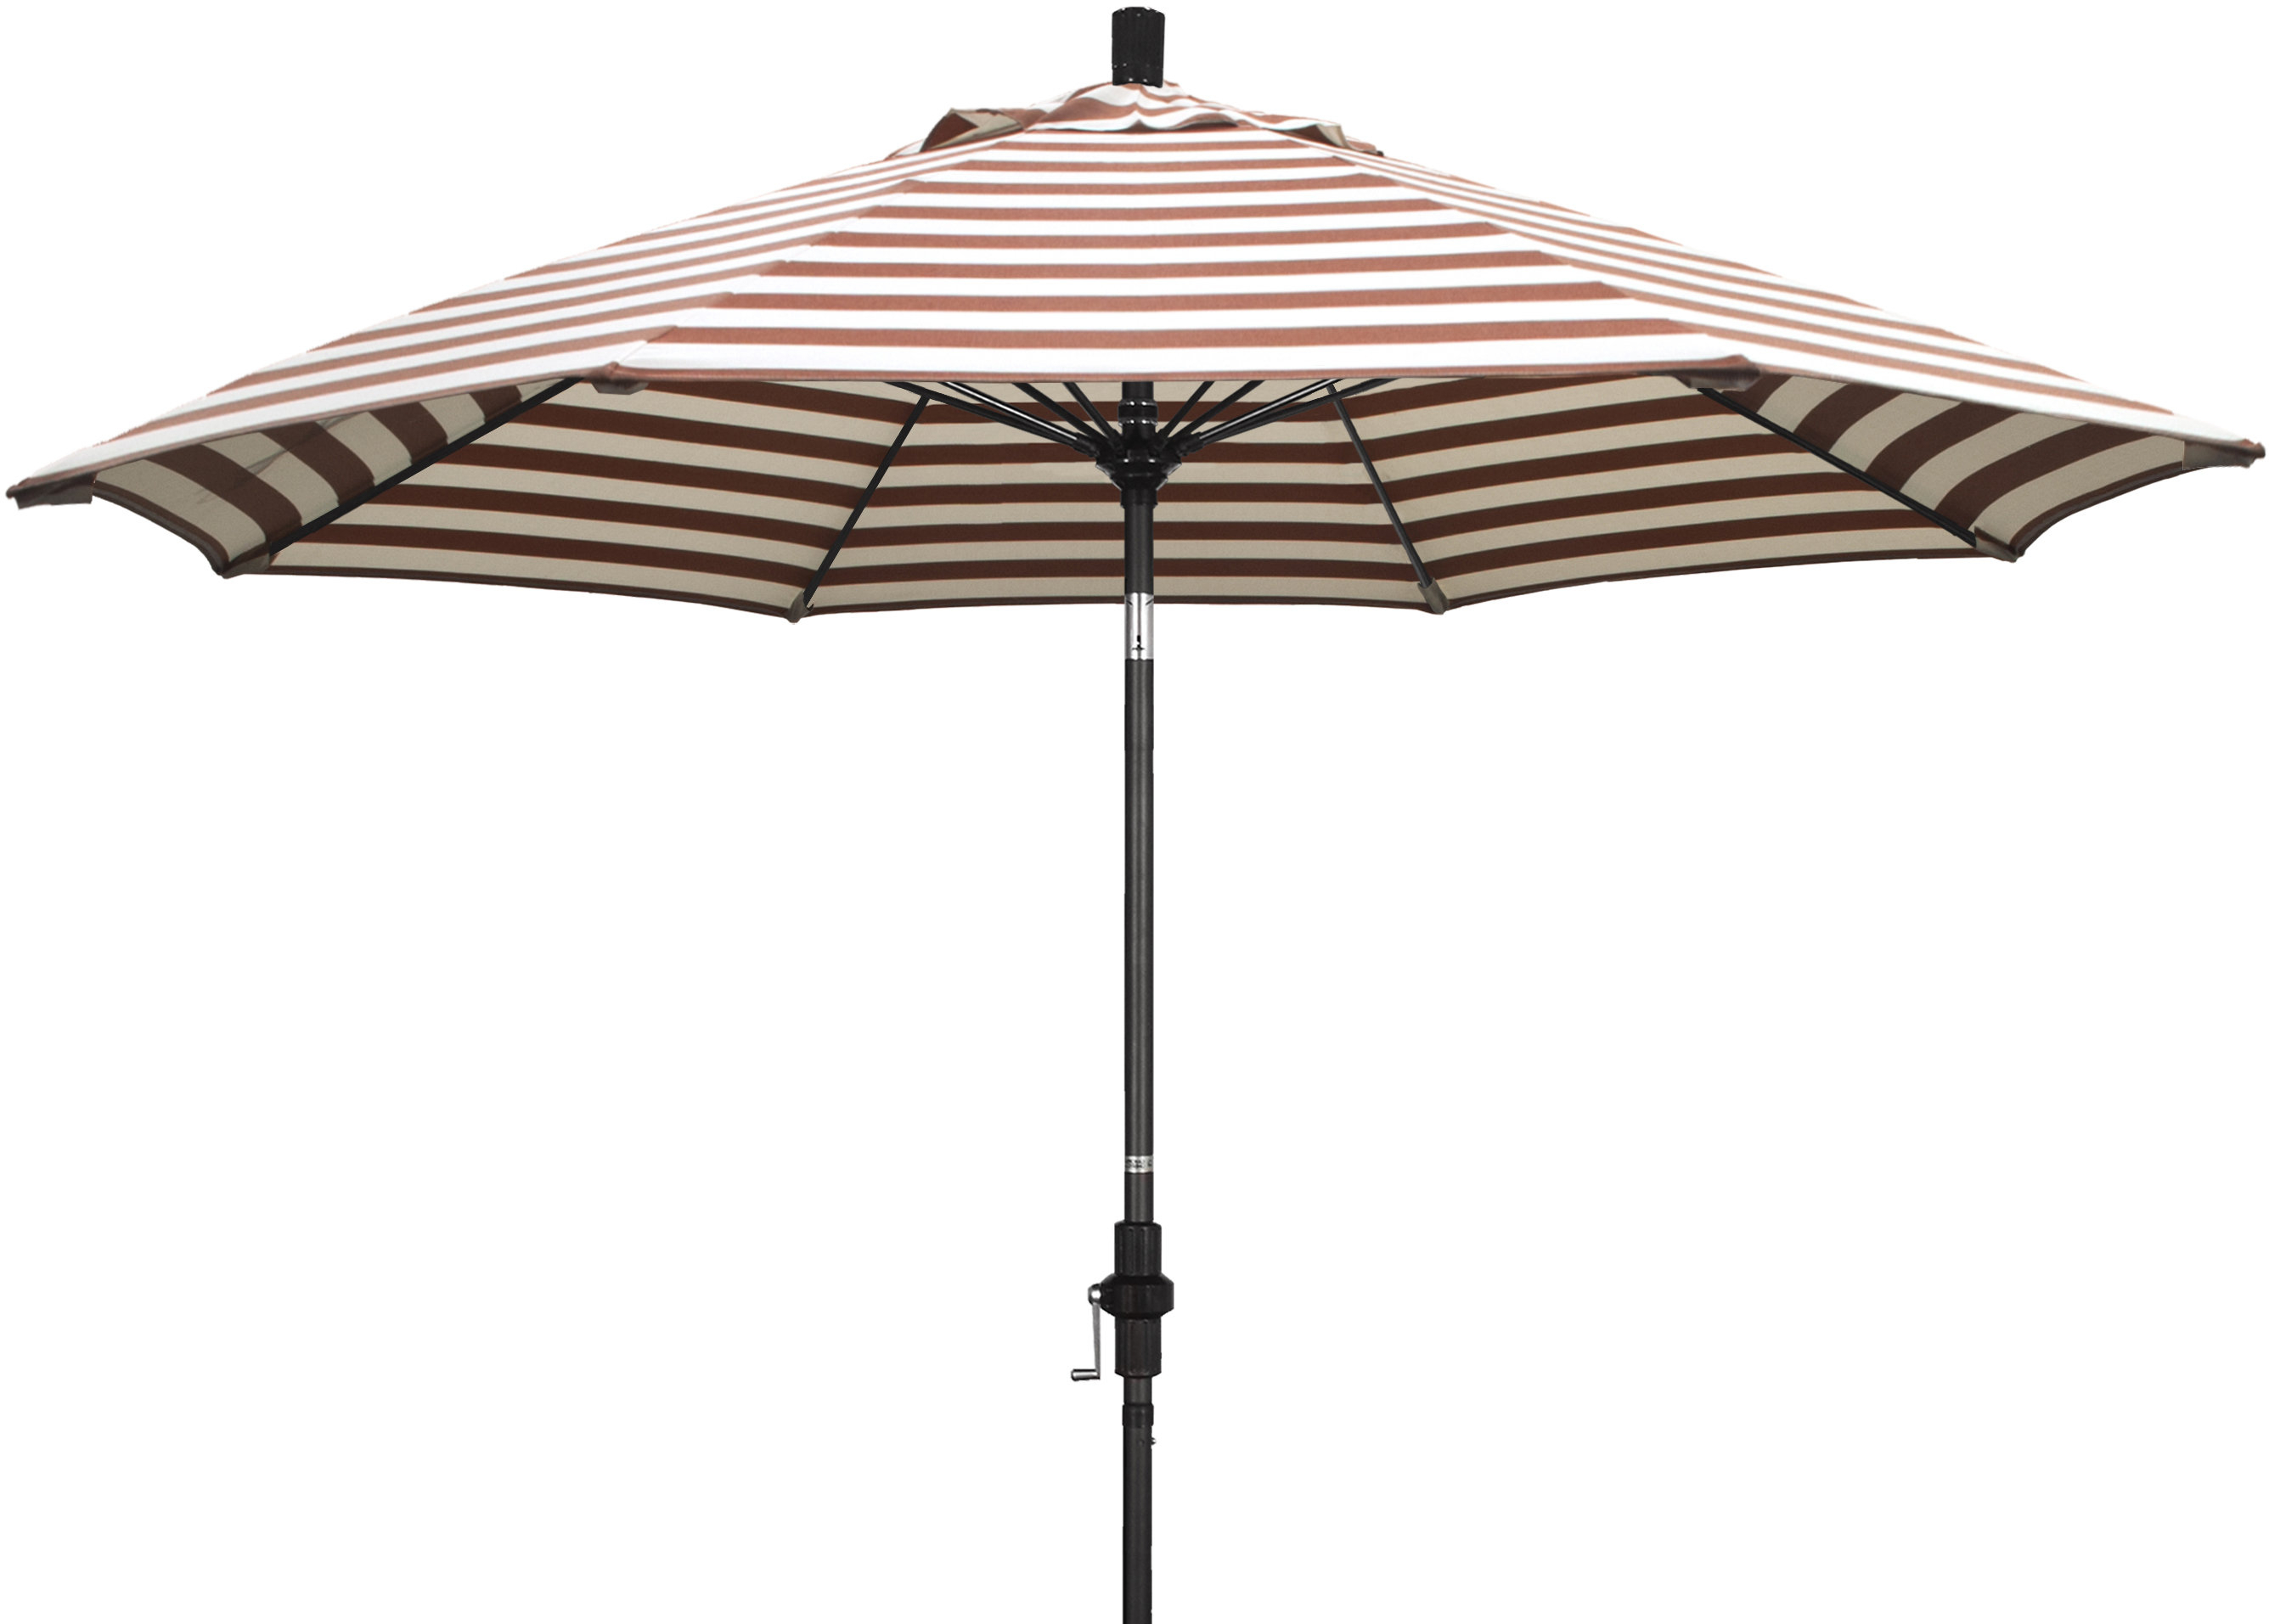 9' Market Umbrella Intended For Most Current Carina Market Umbrellas (View 1 of 20)